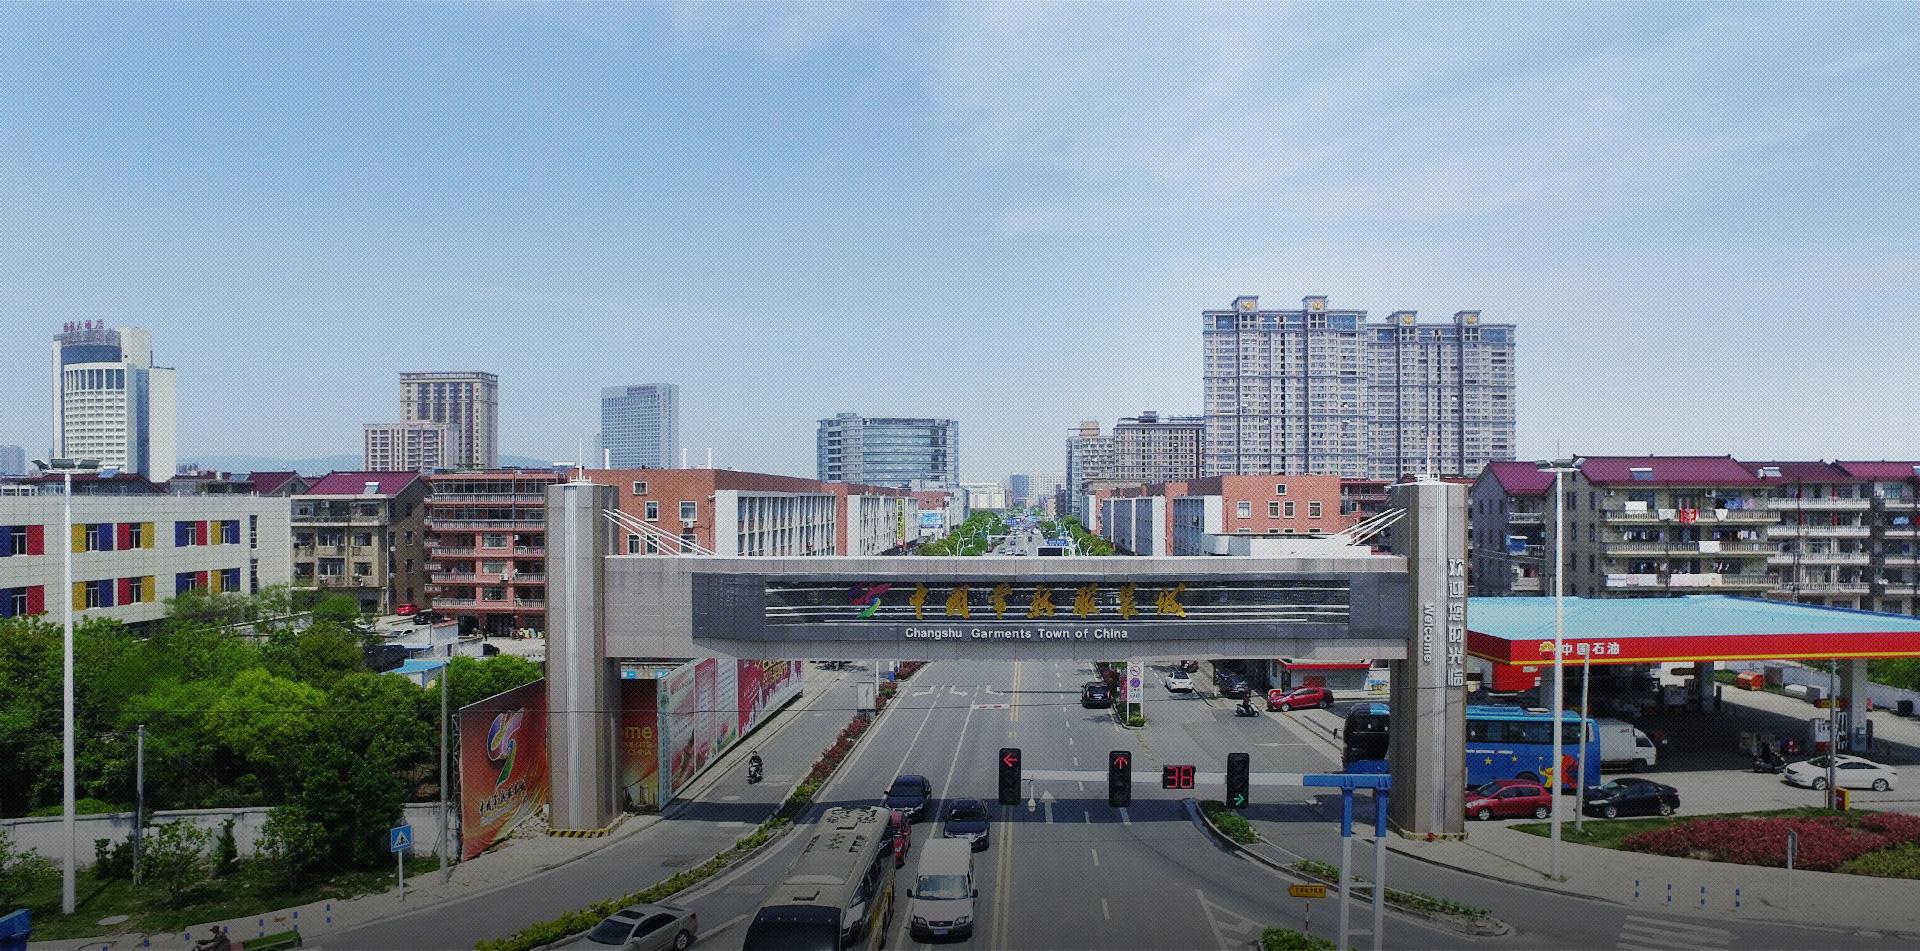 Malls View